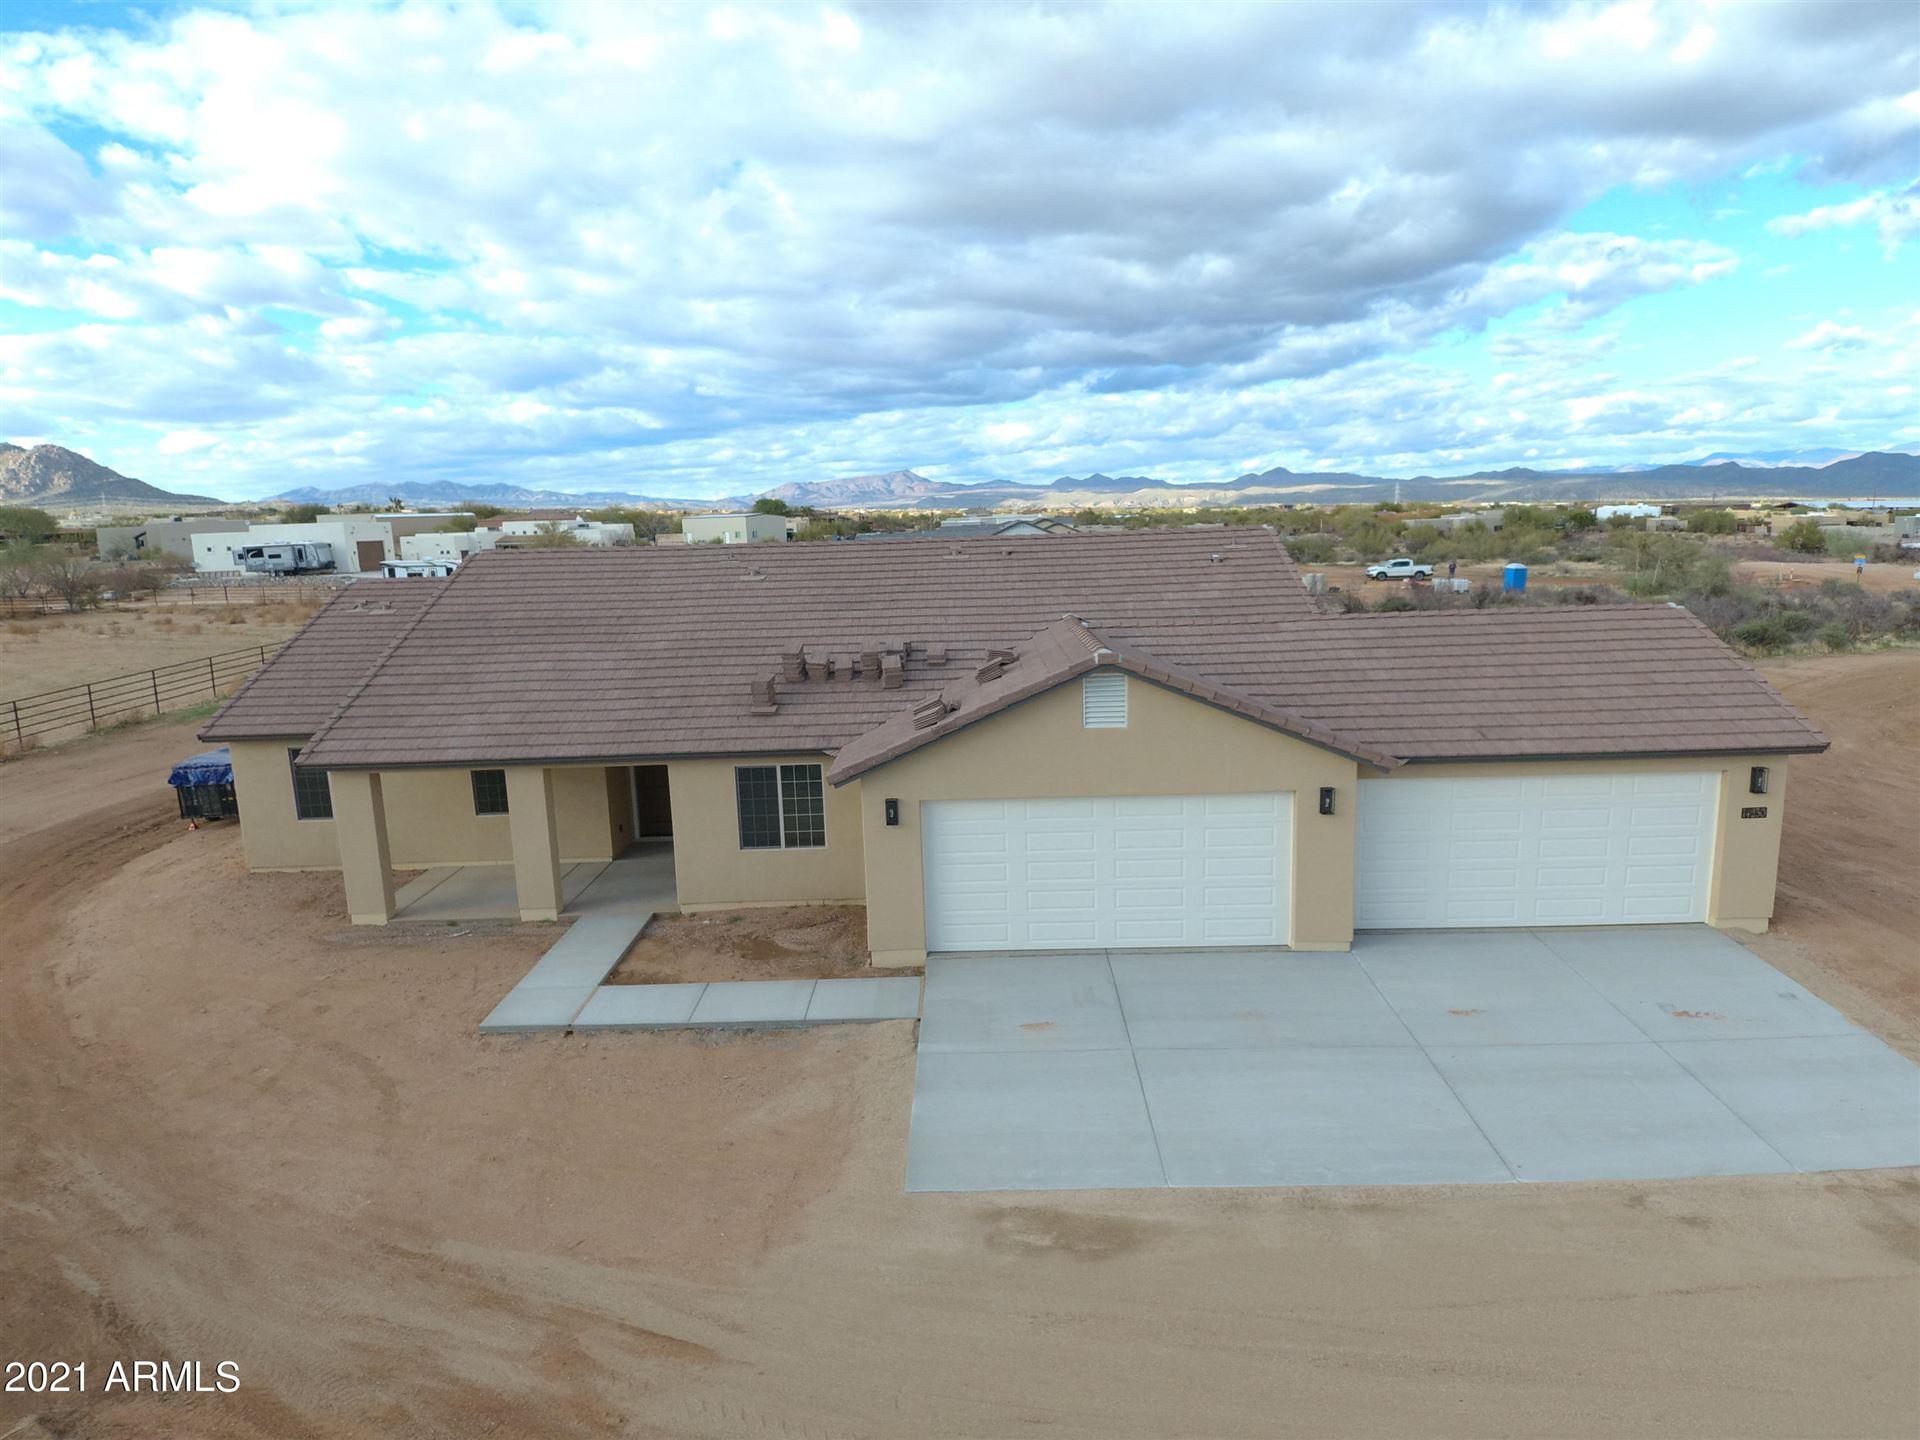 30409 N 139th Street #Lot B, Scottsdale, AZ 85262 - #: 6198712